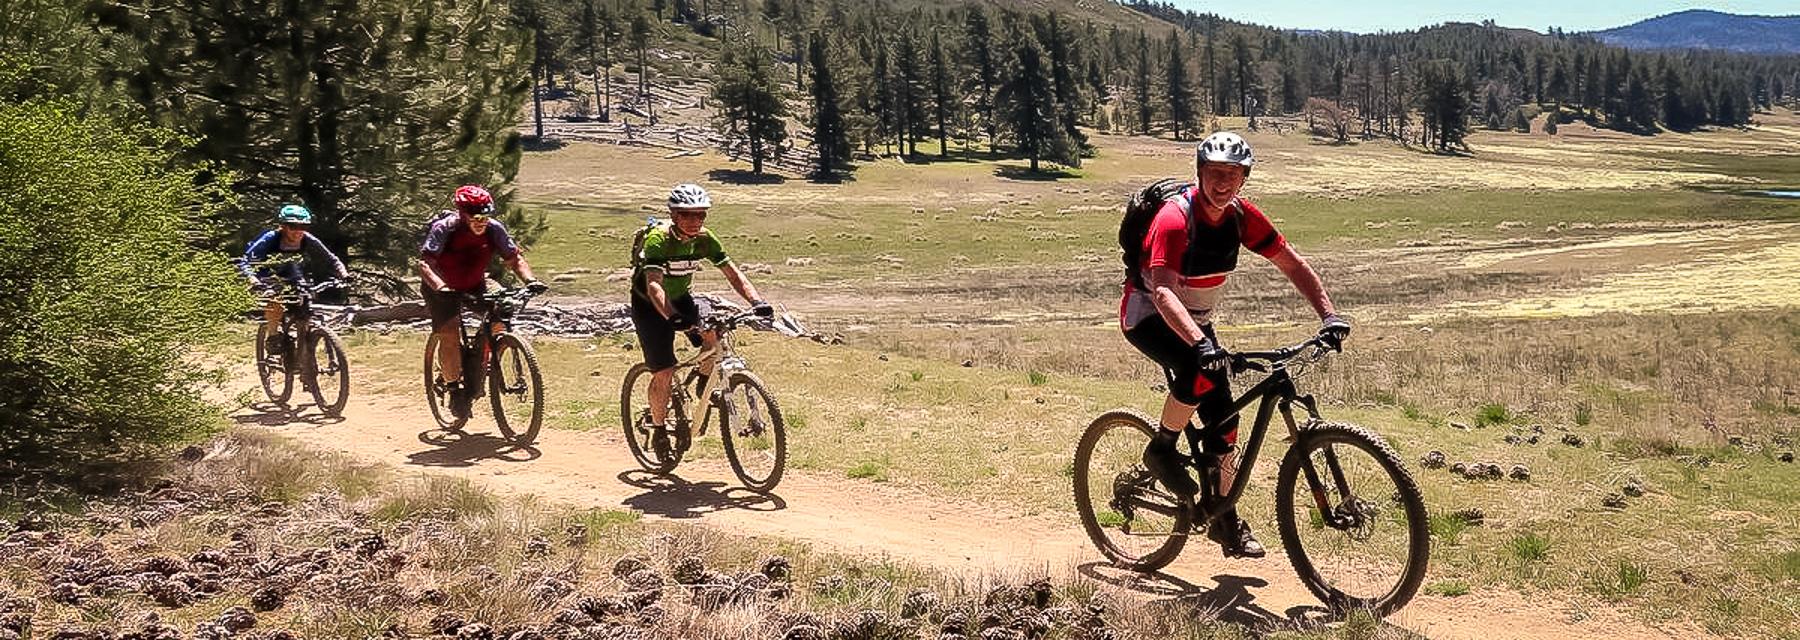 California Mountain Biking Coalition